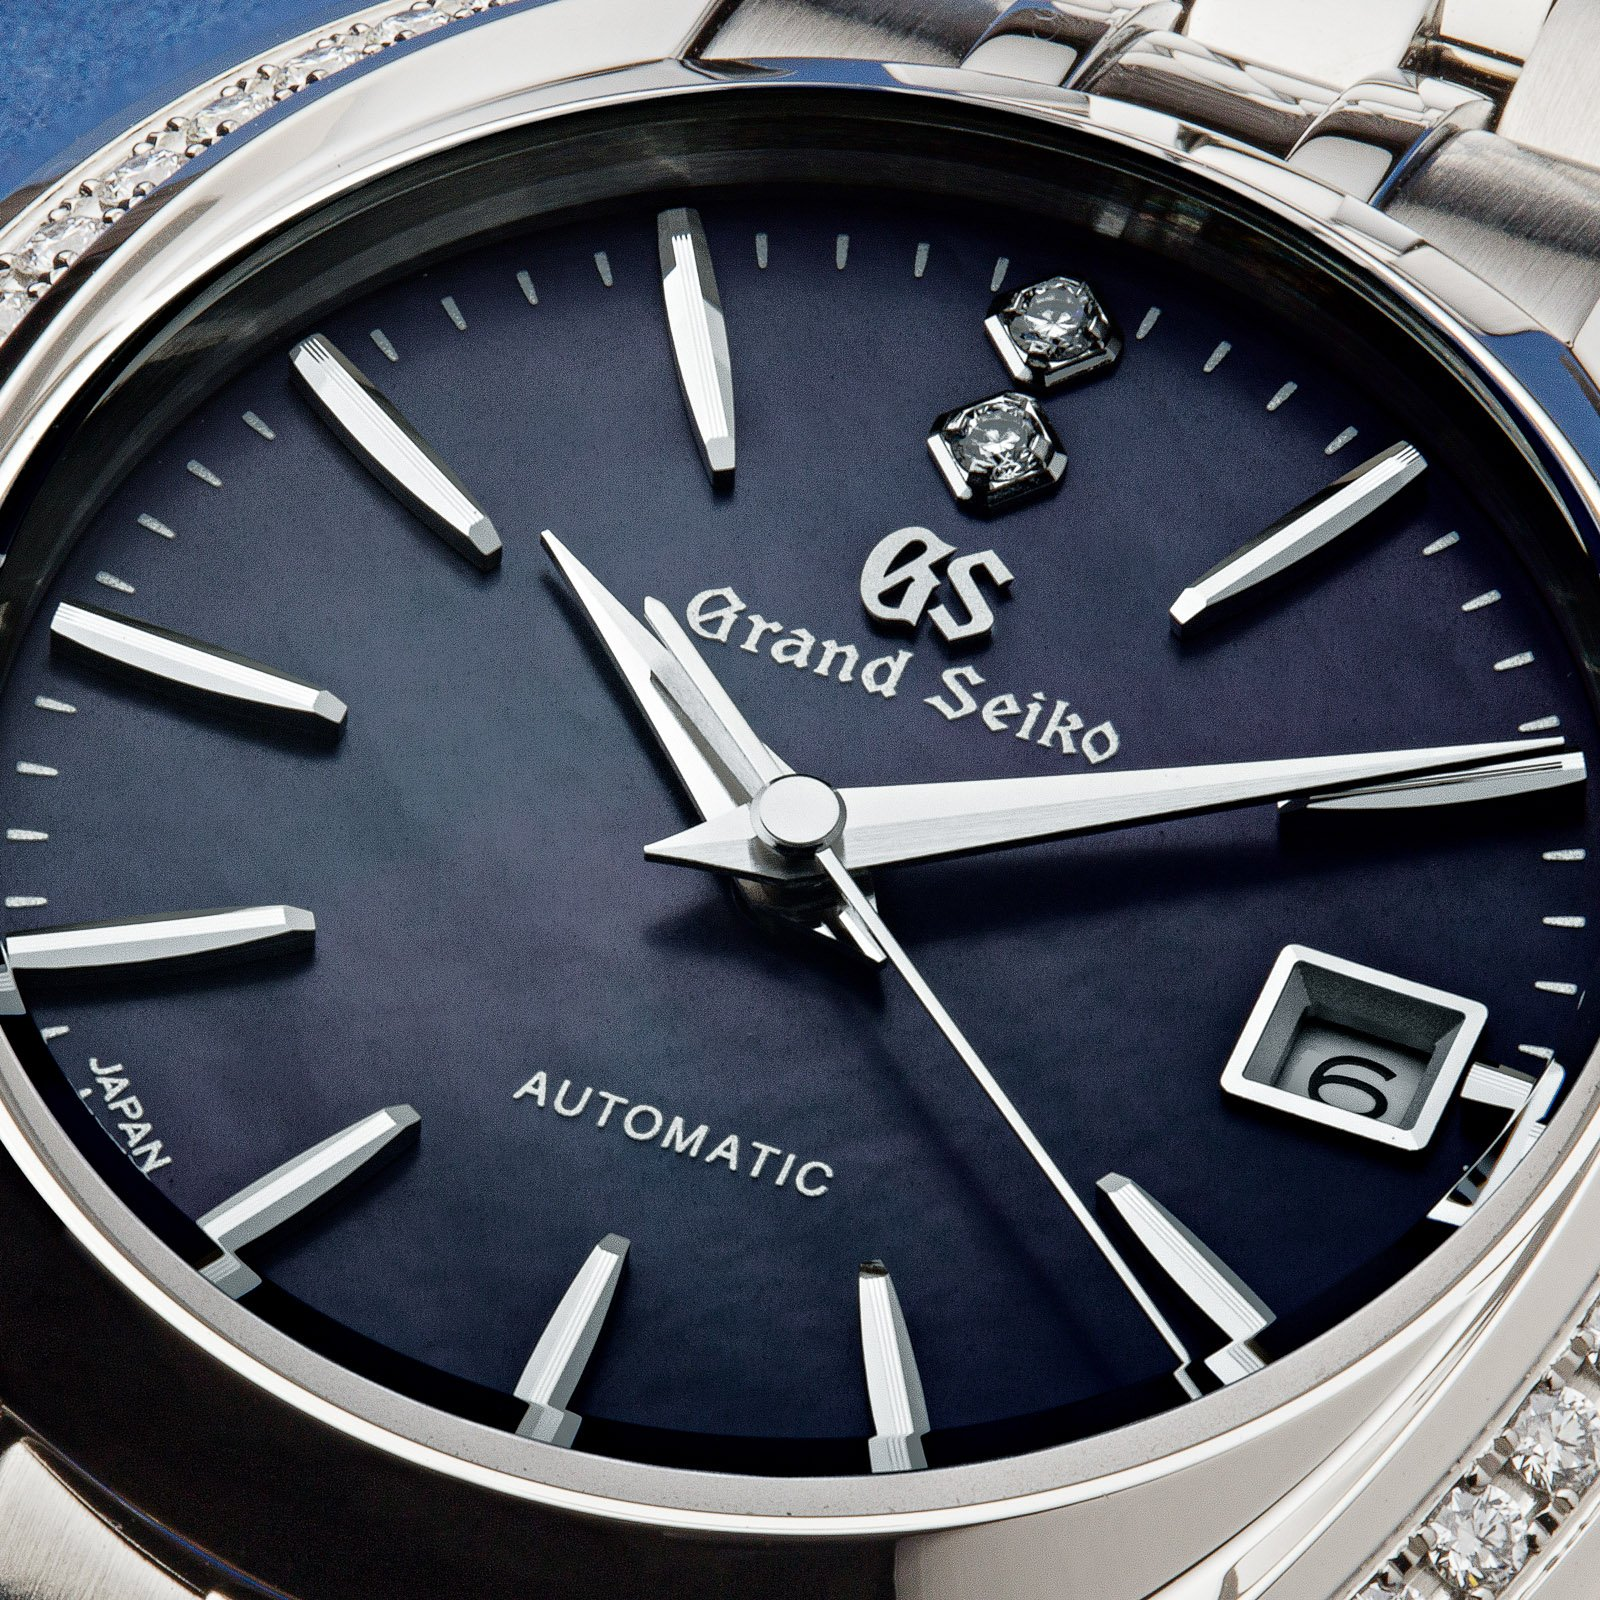 Grand Seiko wristwatch STGK013 - macro of the dark textured dial.